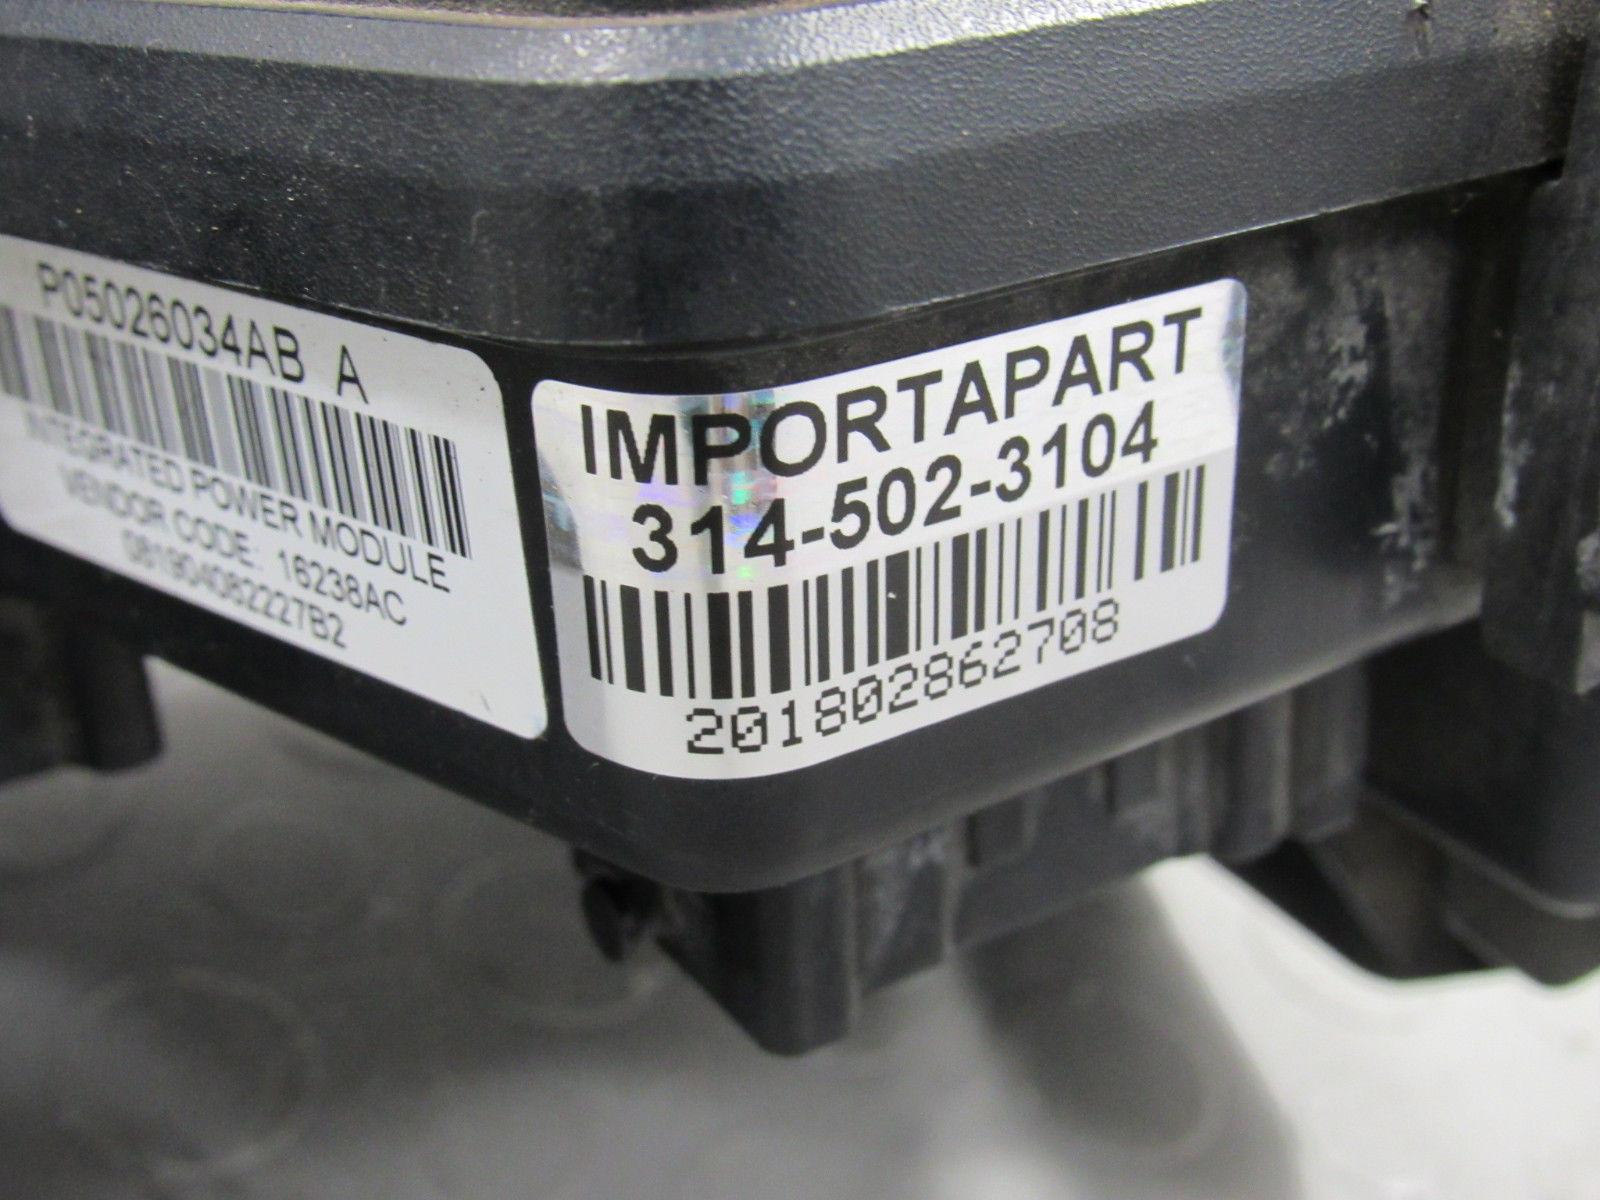 2003 Dodge Ram 2500 Fuse Box Location - Catalogue of Schemas on